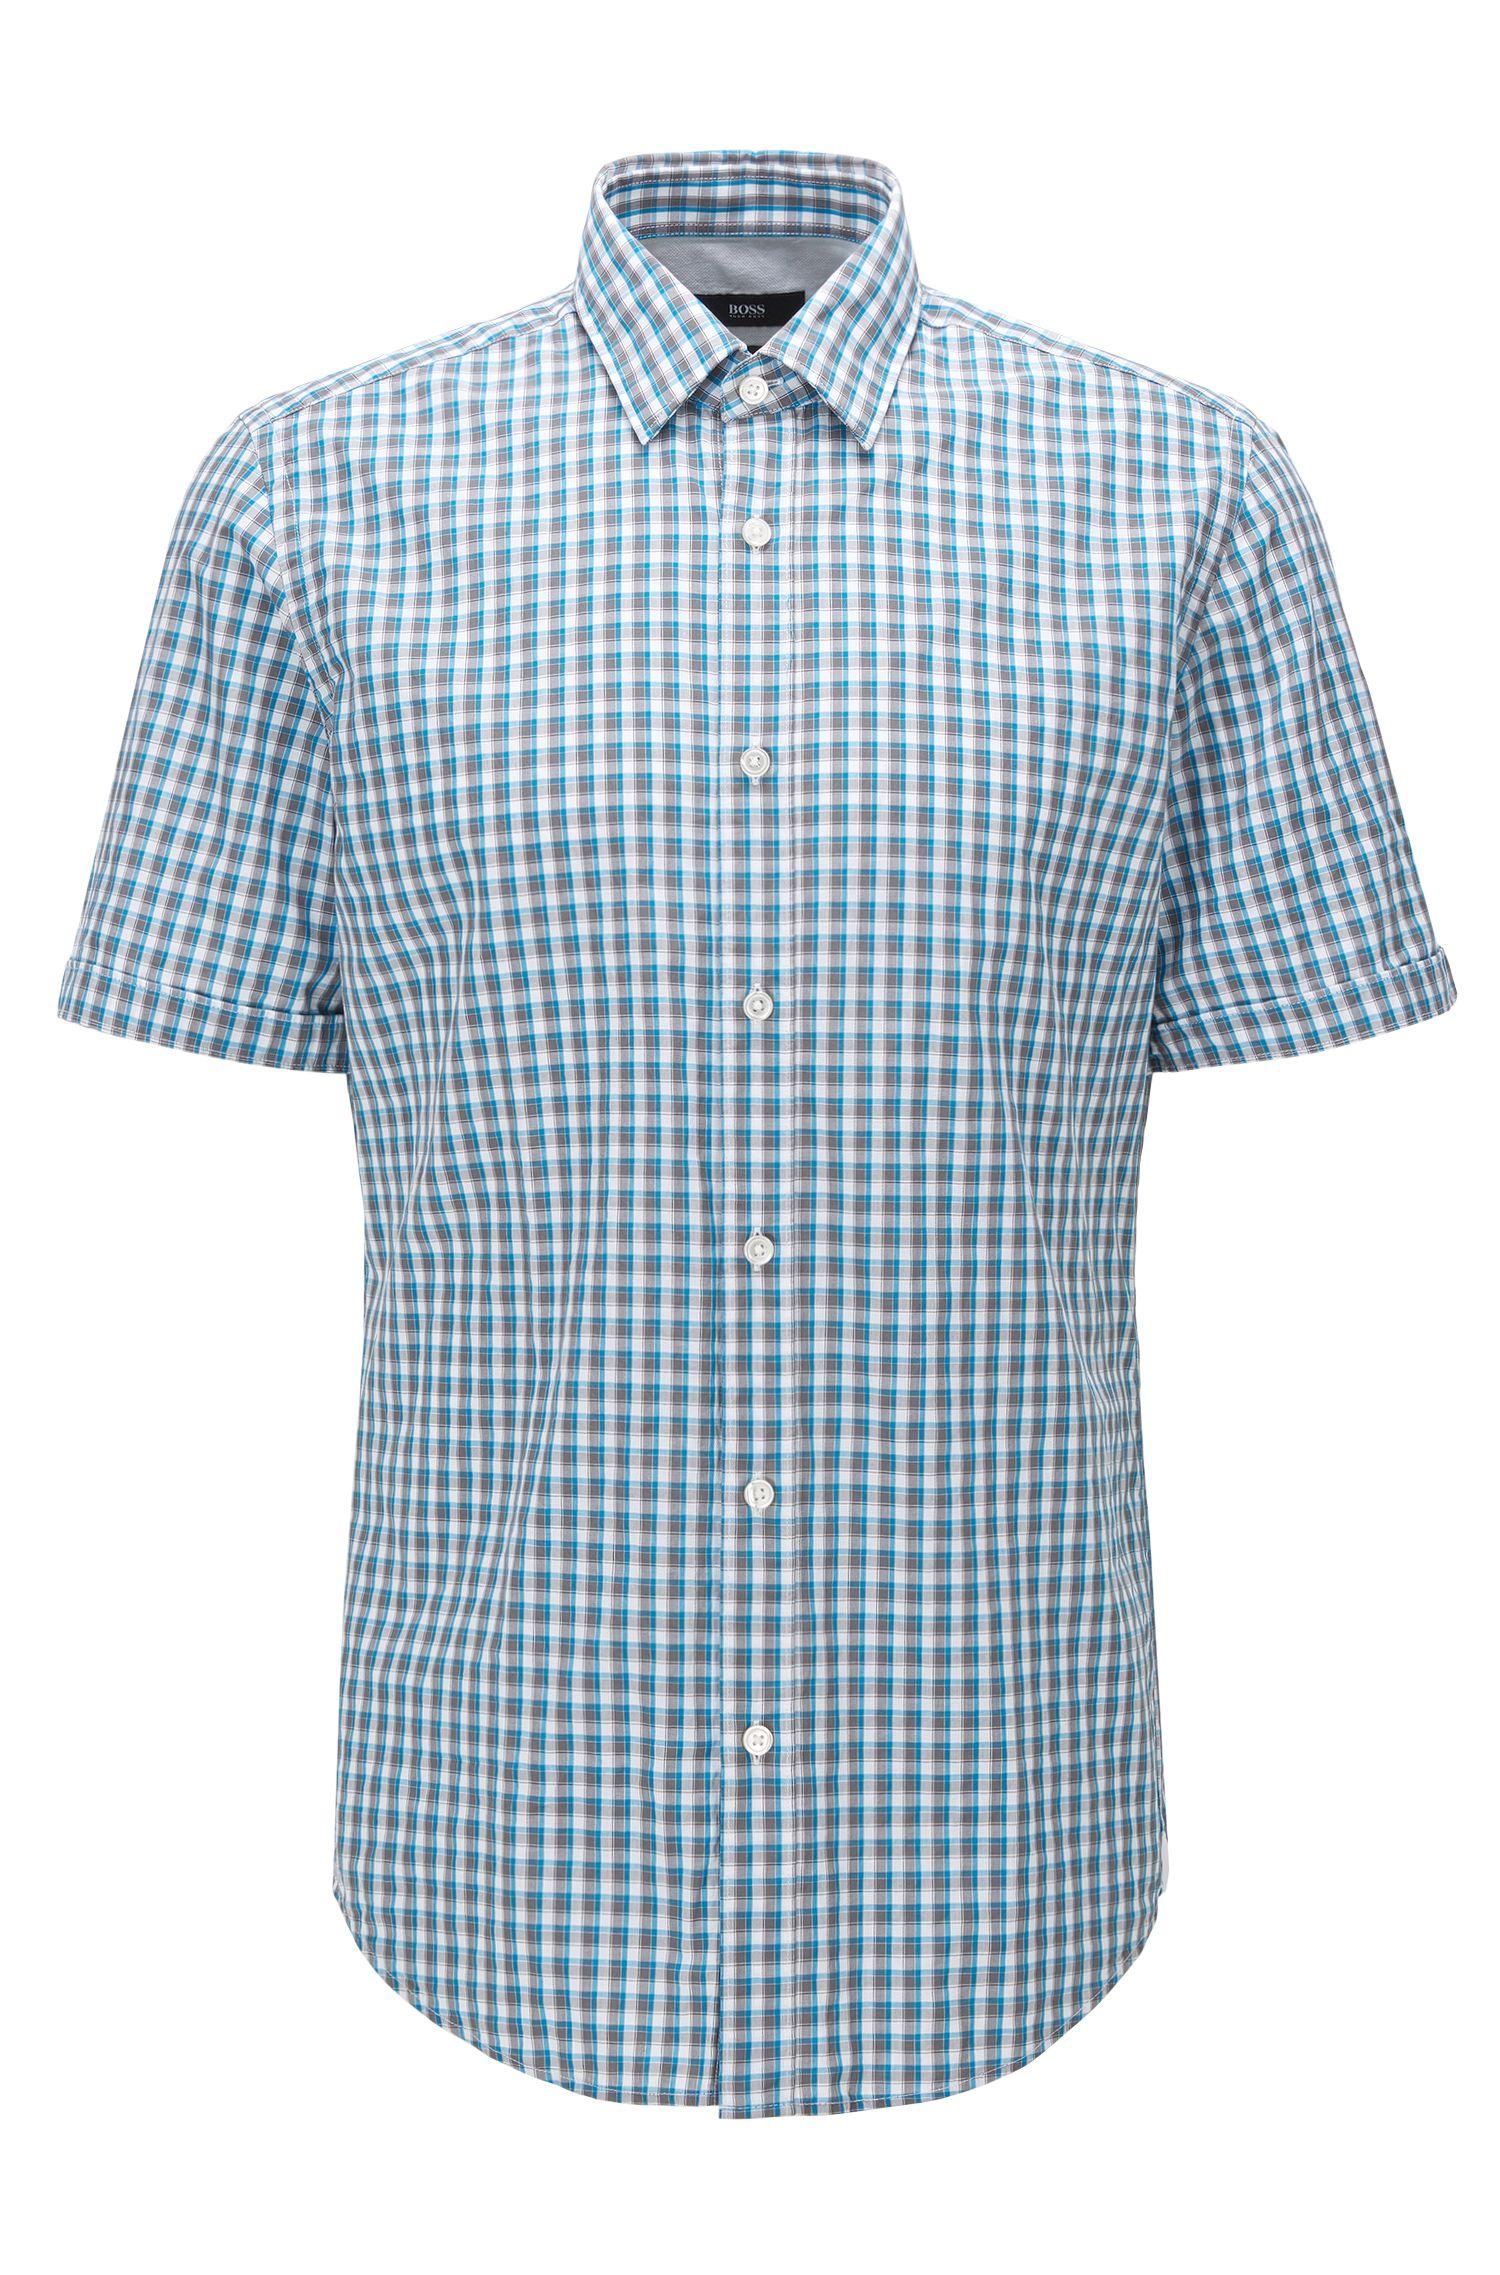 'Luka' | Regular Fit, Check Cotton Button Down Shirt